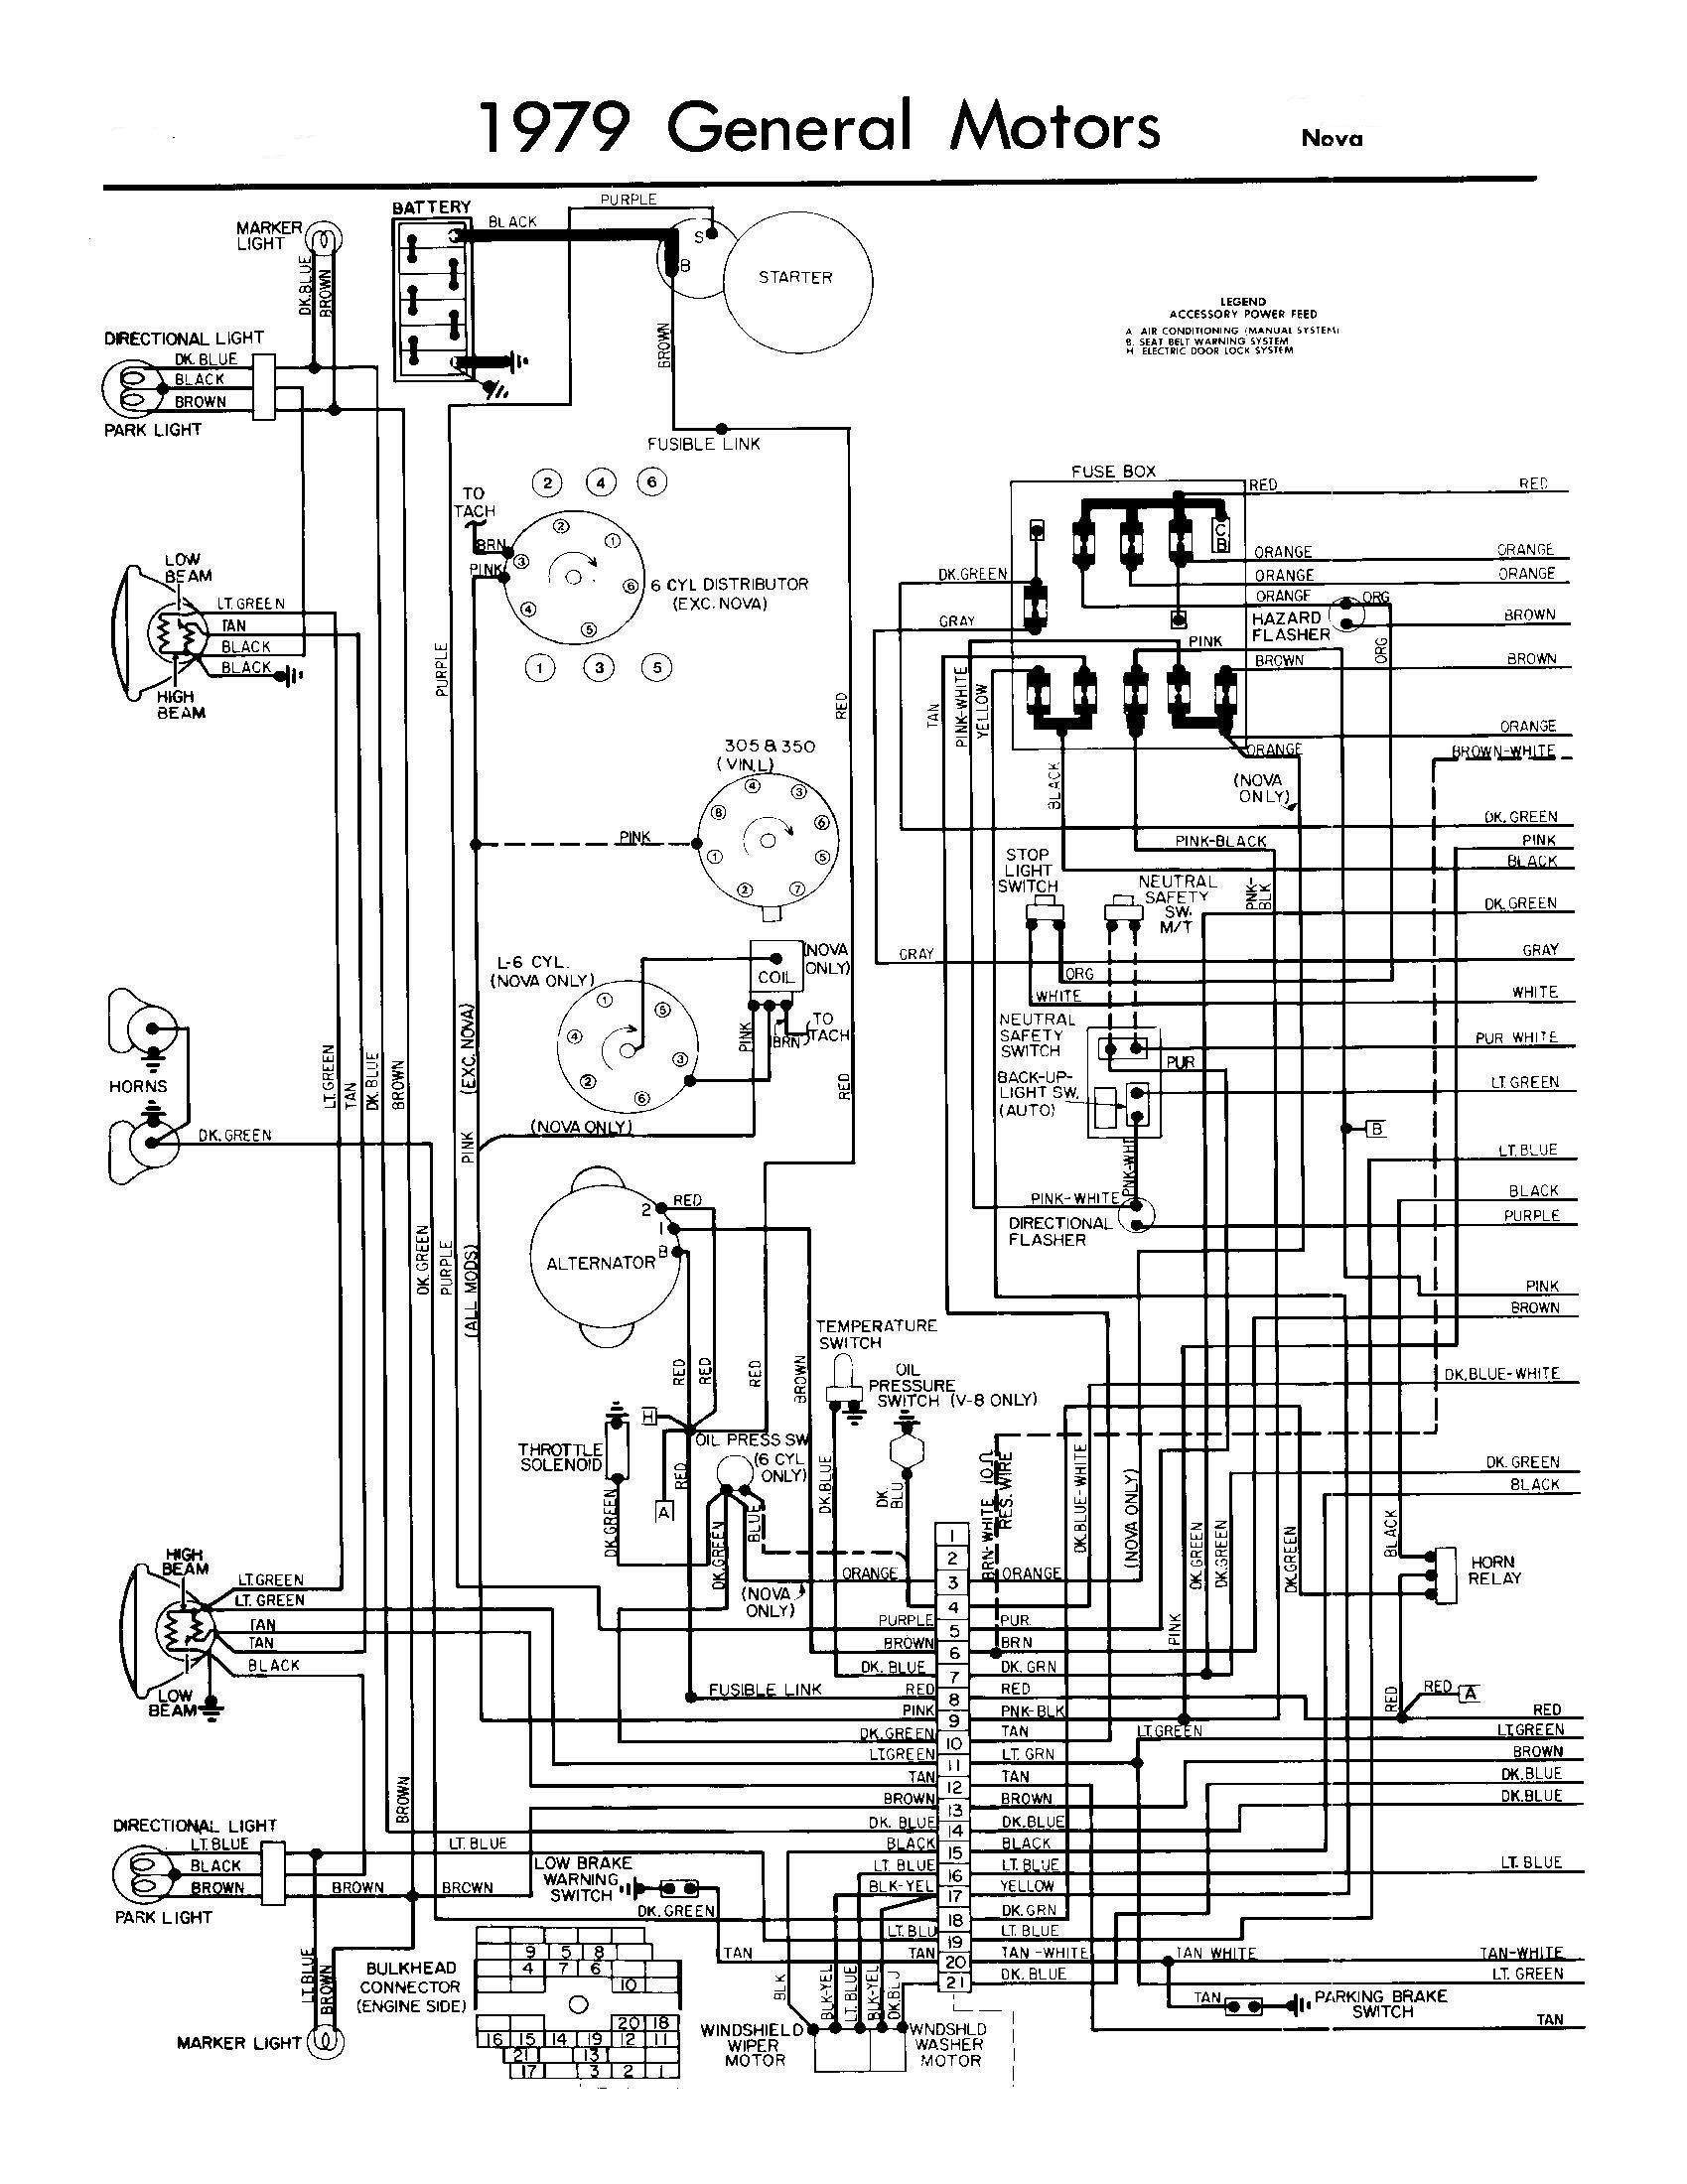 Wiring Diagram On 76 Chevy Truck - Wiring Diagram Data - 1982 Chevy Truck Wiring Diagram